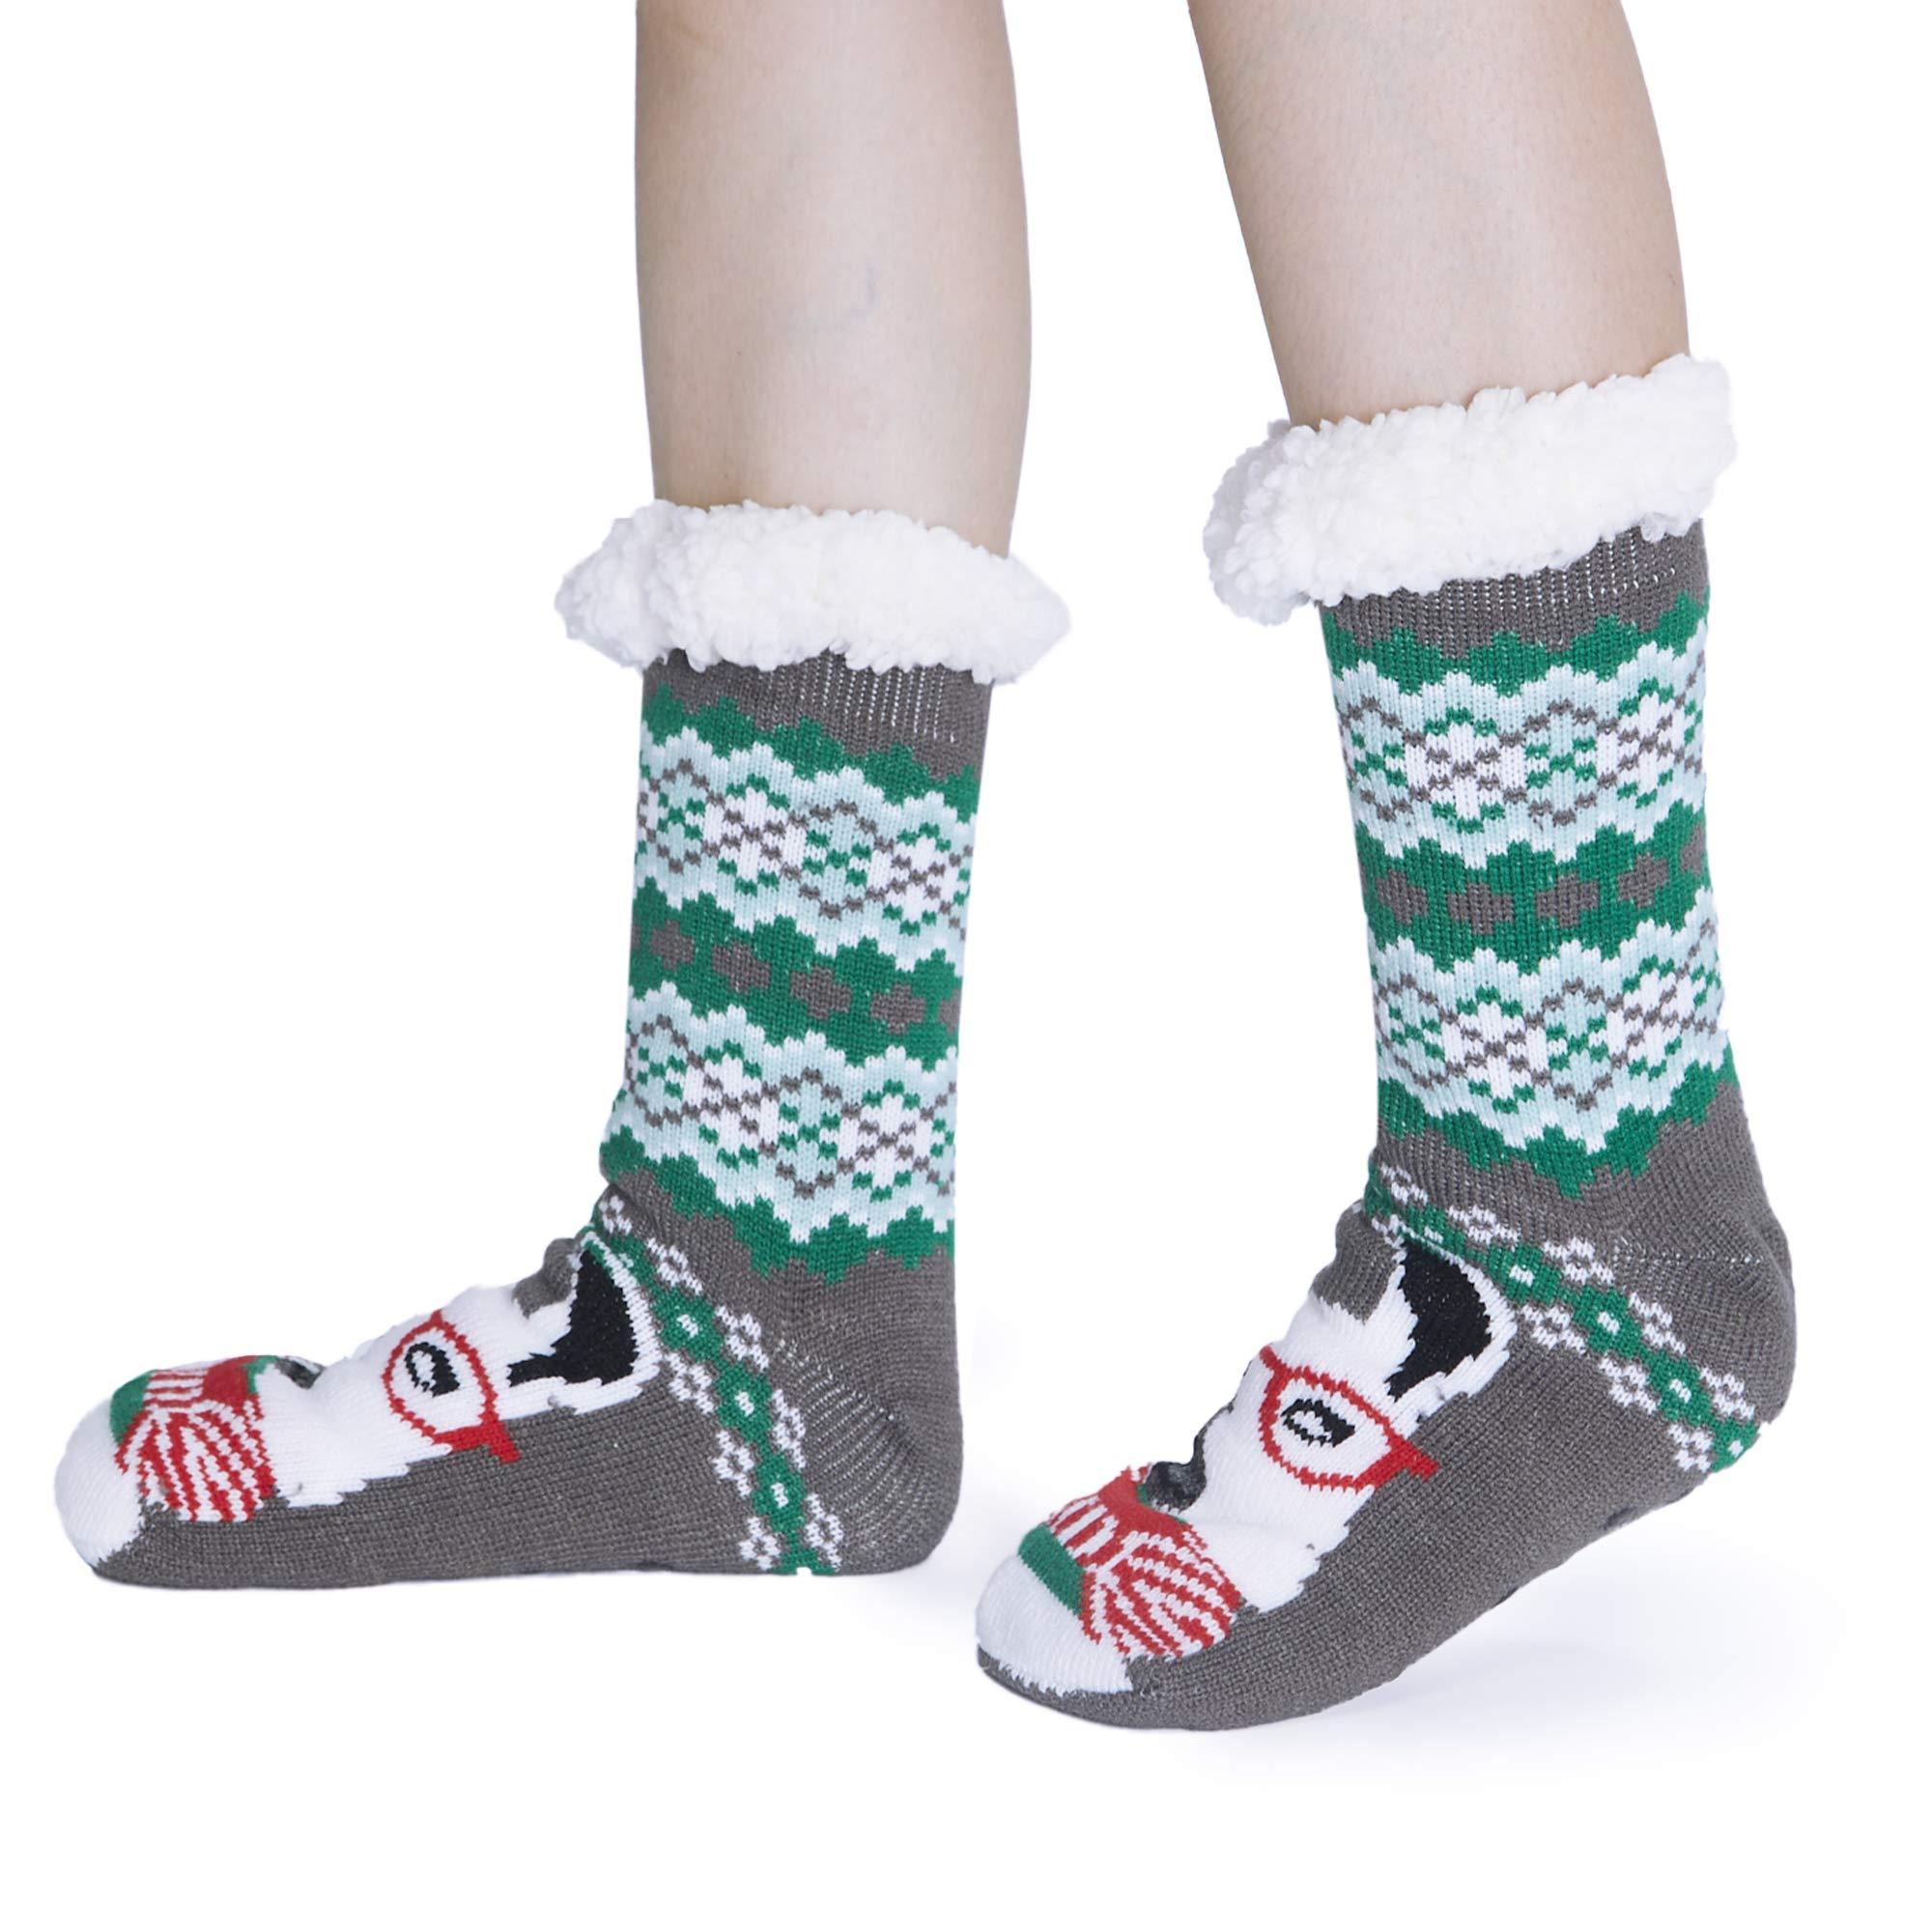 ALISISTER Women Men Fuzzy Cozy Soft Warm Fleece lined Winter Slipper Socks Red 3D Cute Reindeer Winter Christmas Gift Socks With Non Slip Grippers